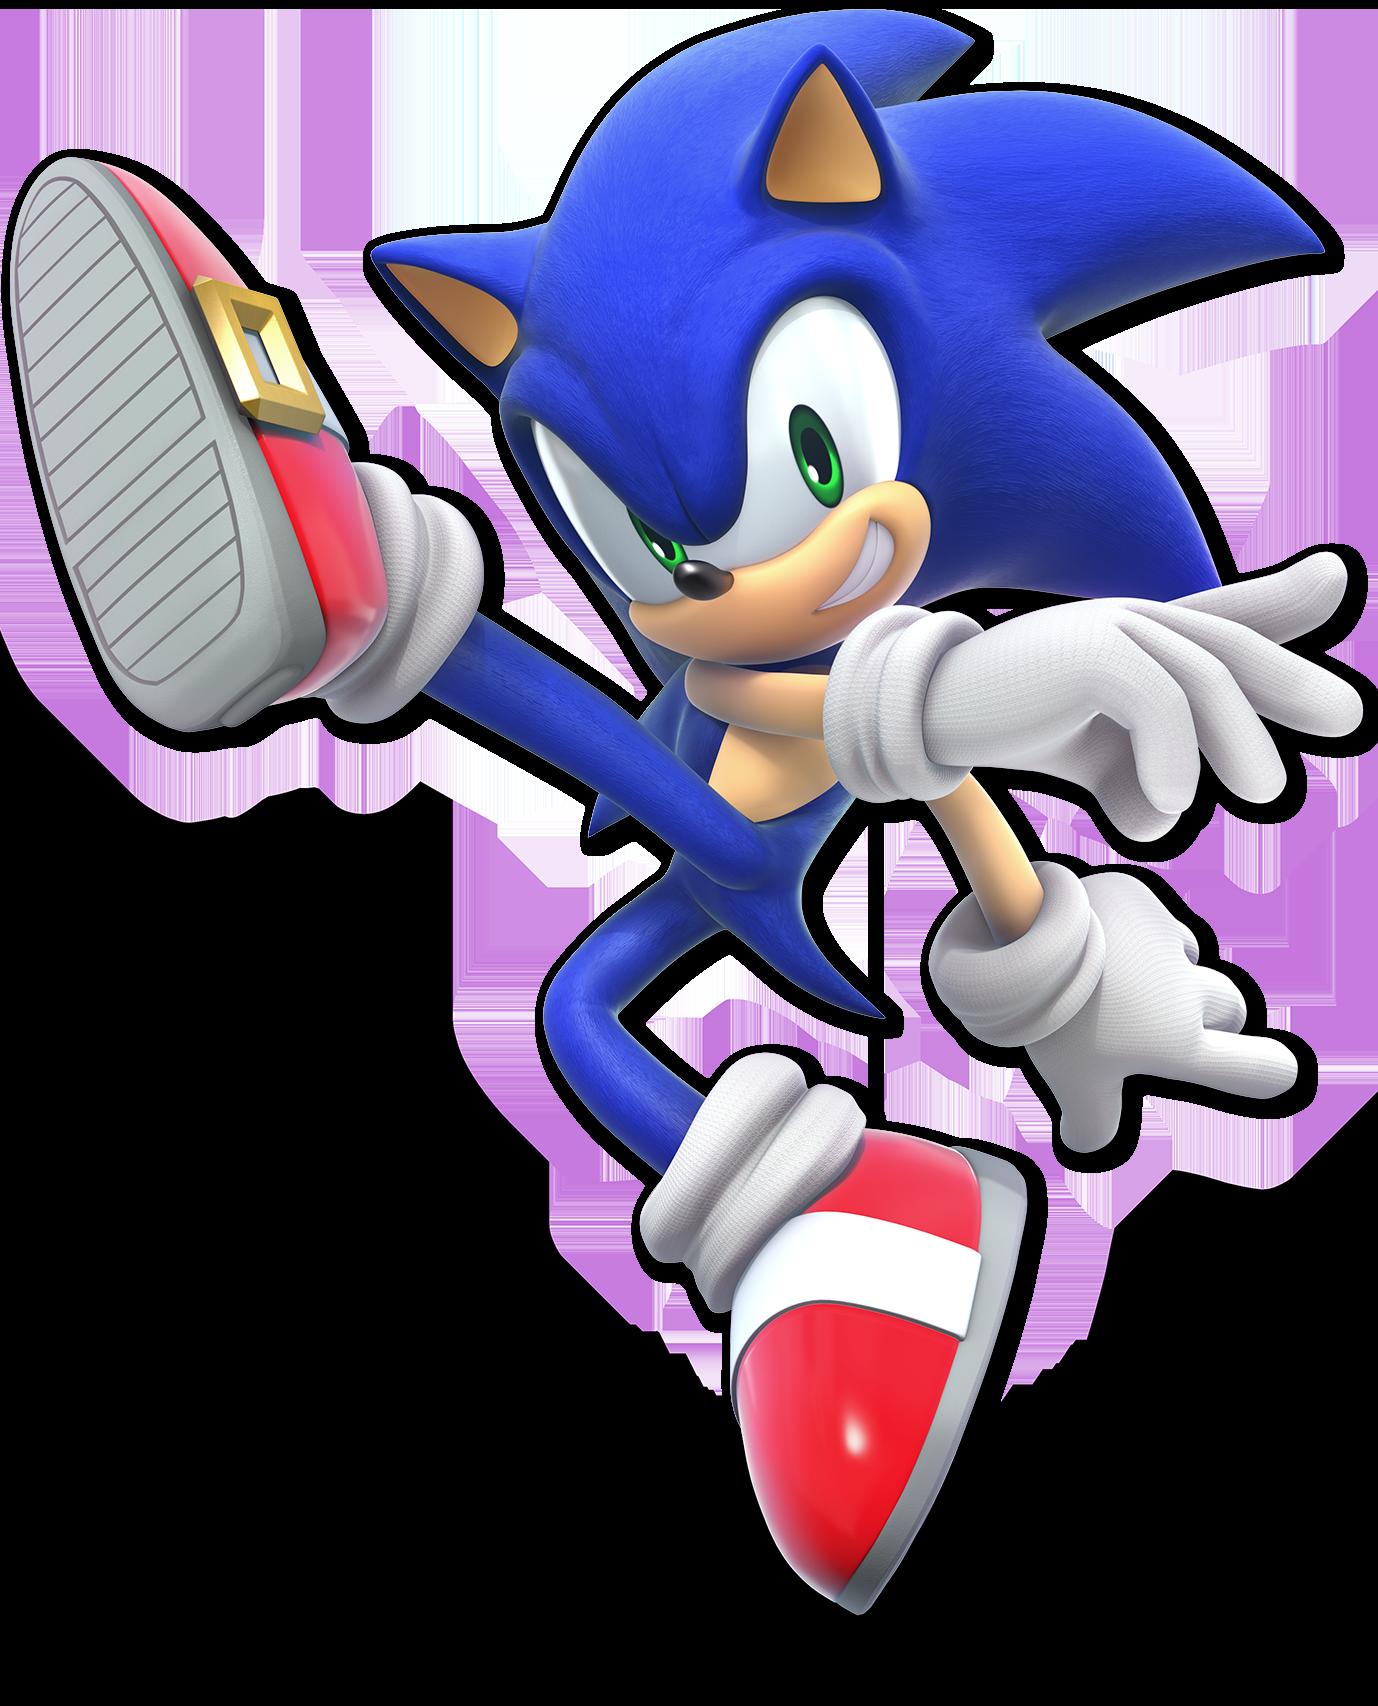 Sonic In Super Smash Bros Ultimate Super Smash Bros Sonic Sonic The Hedgehog